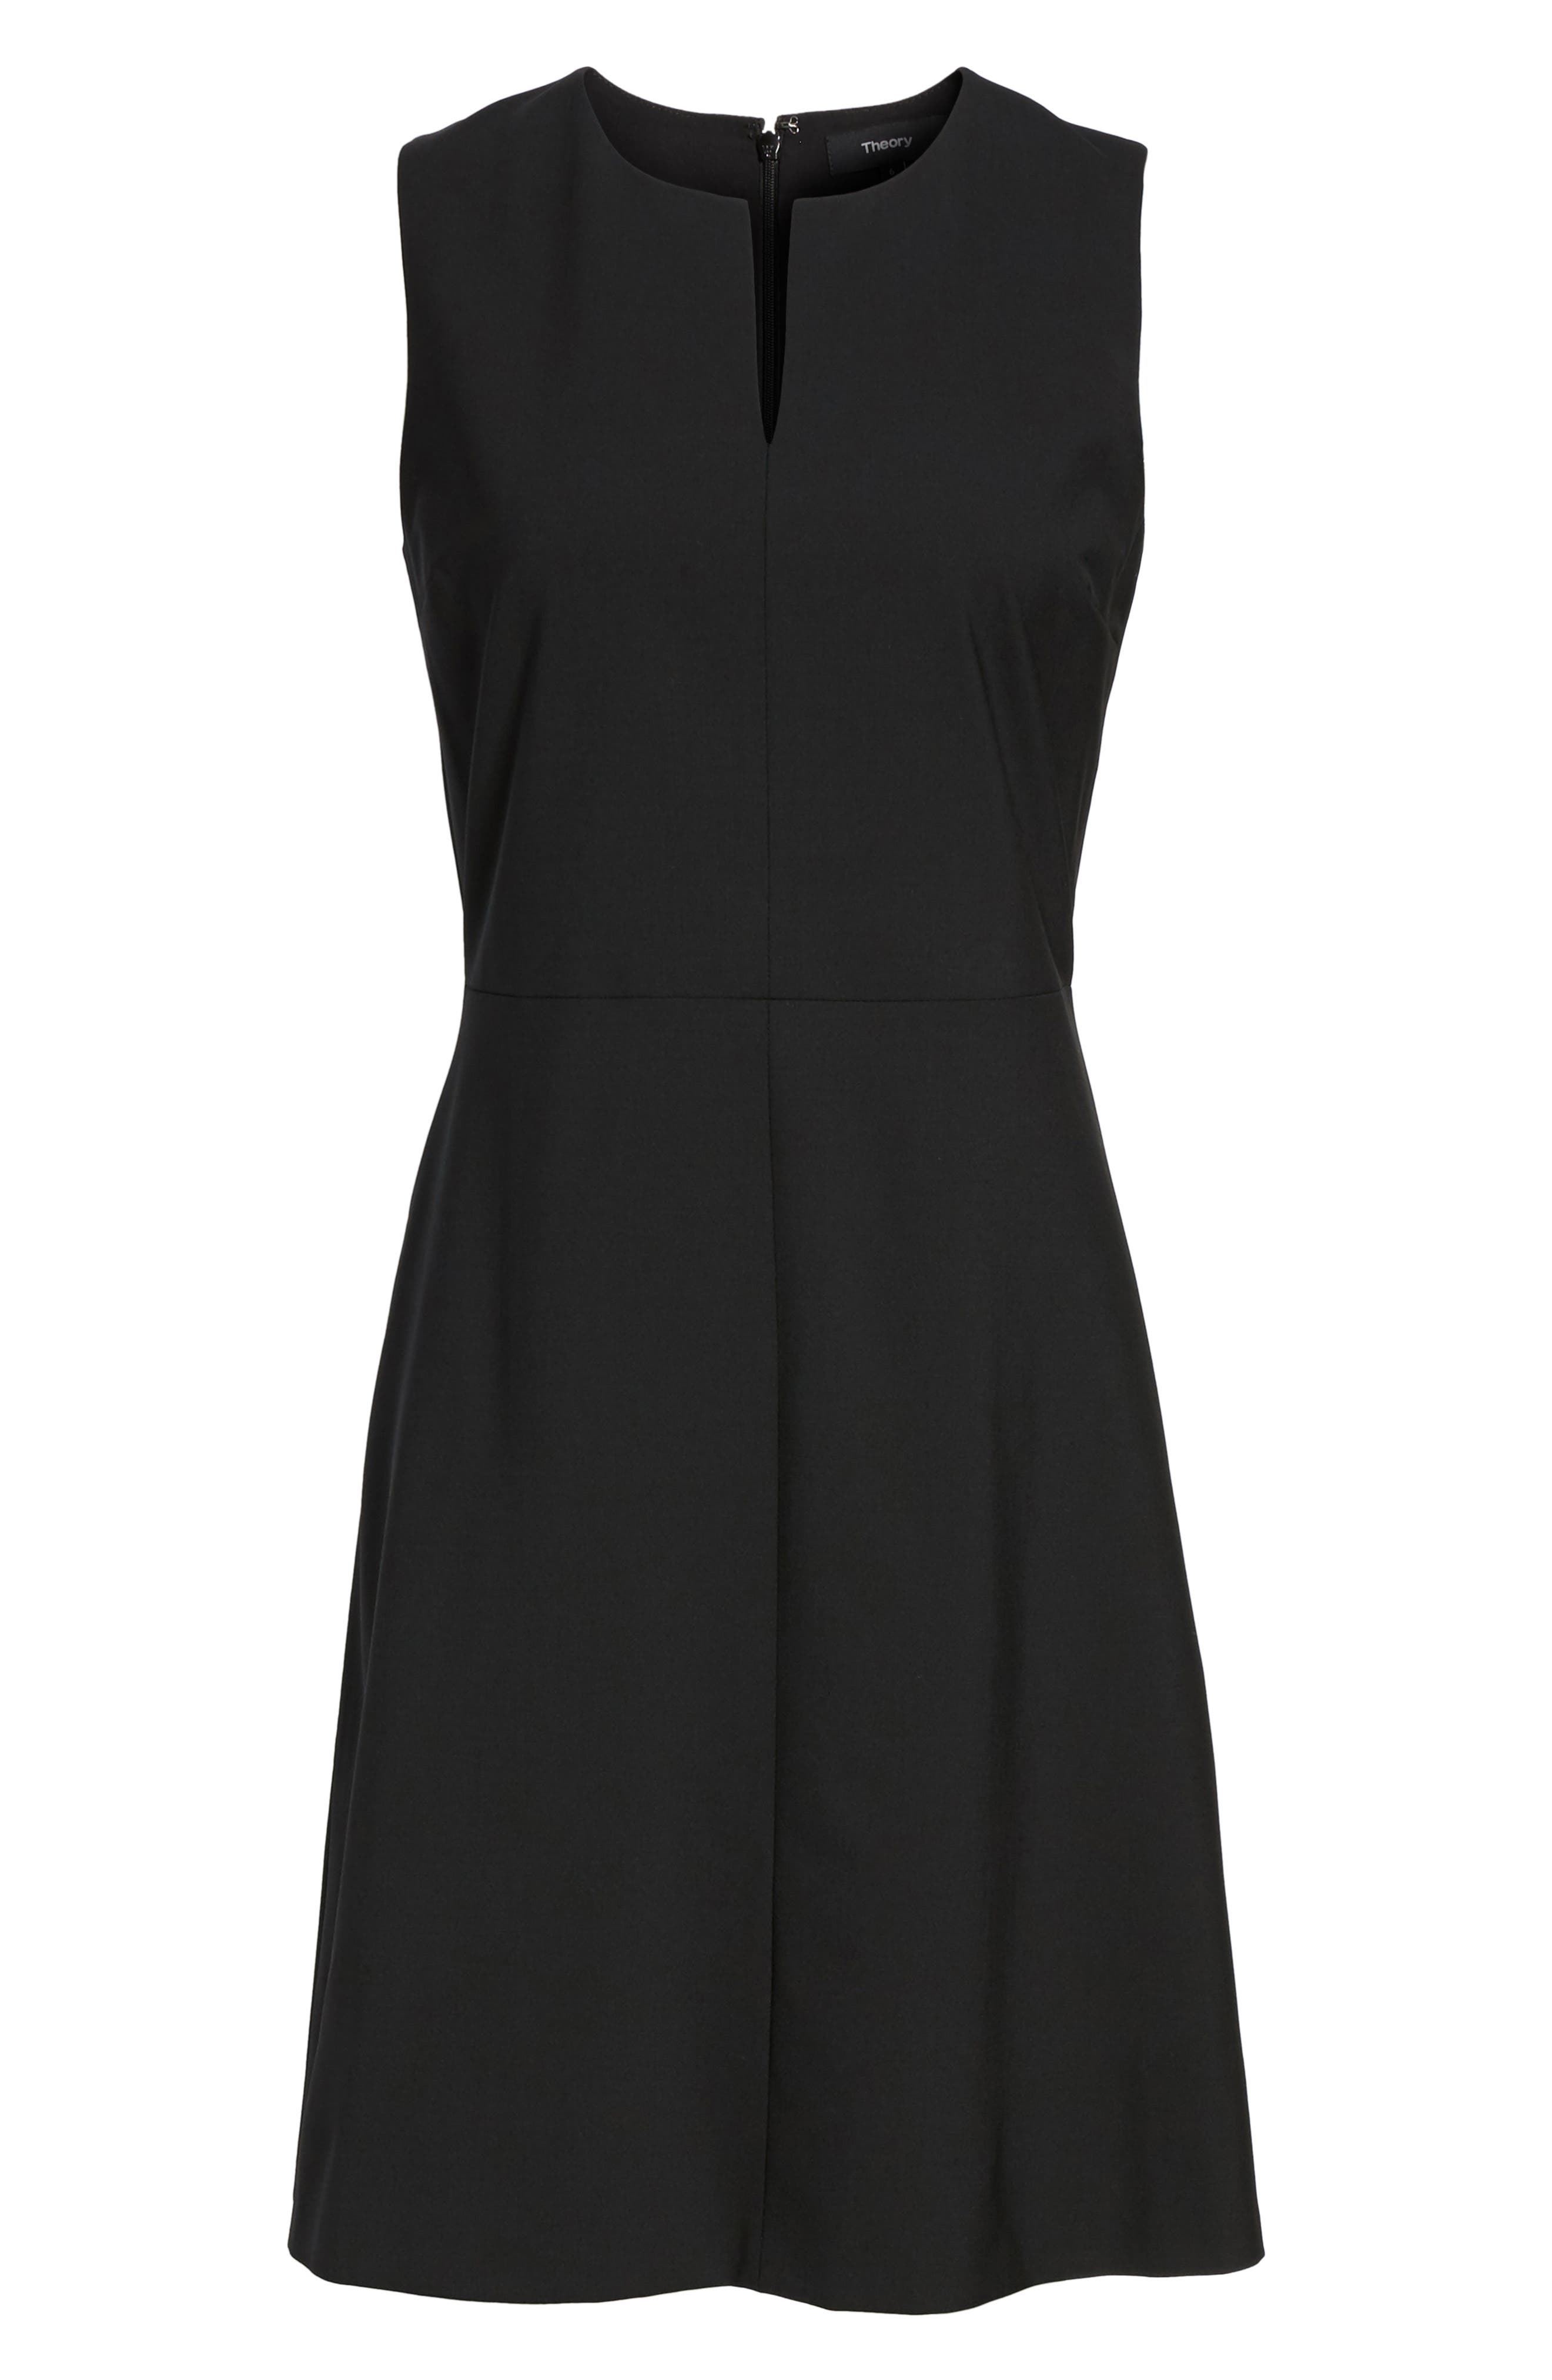 'Miyani' Stretch Wool Fit & Flare Dress, Main, color, 001